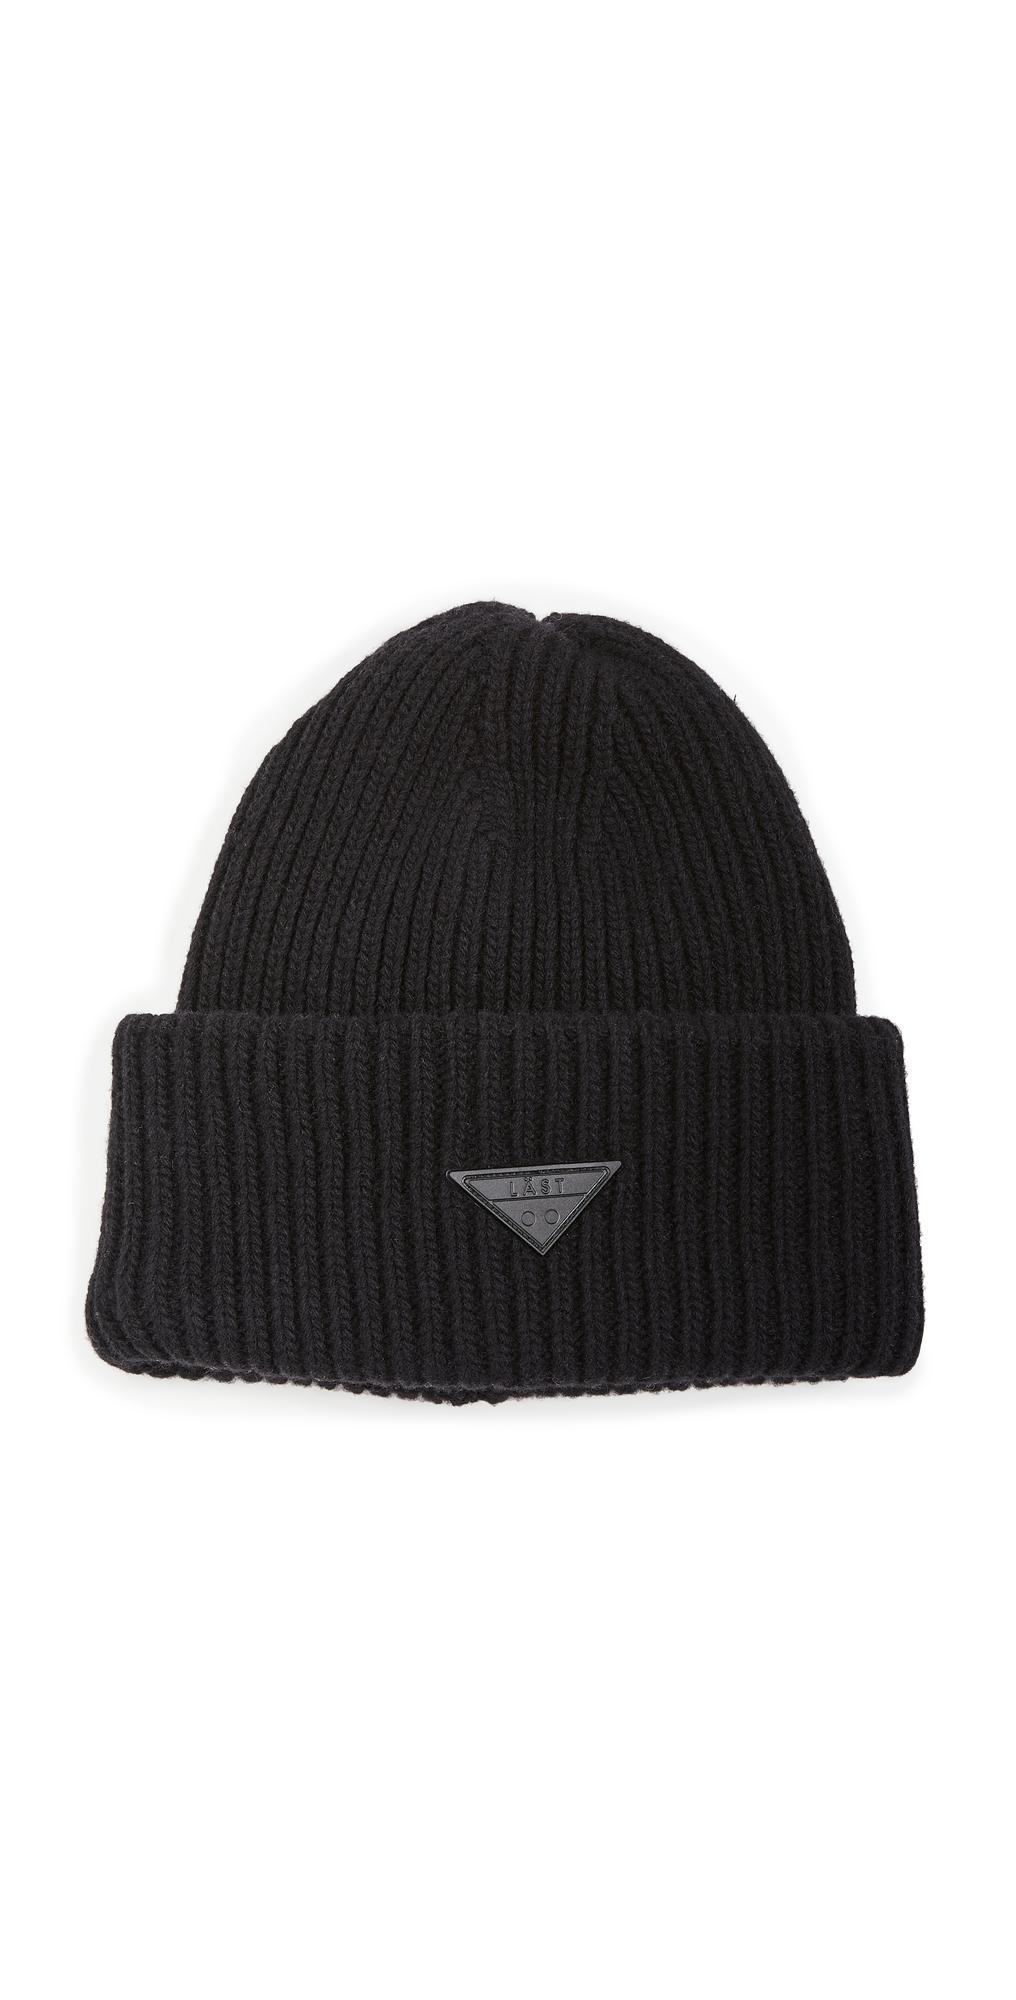 Oversize Black Hat